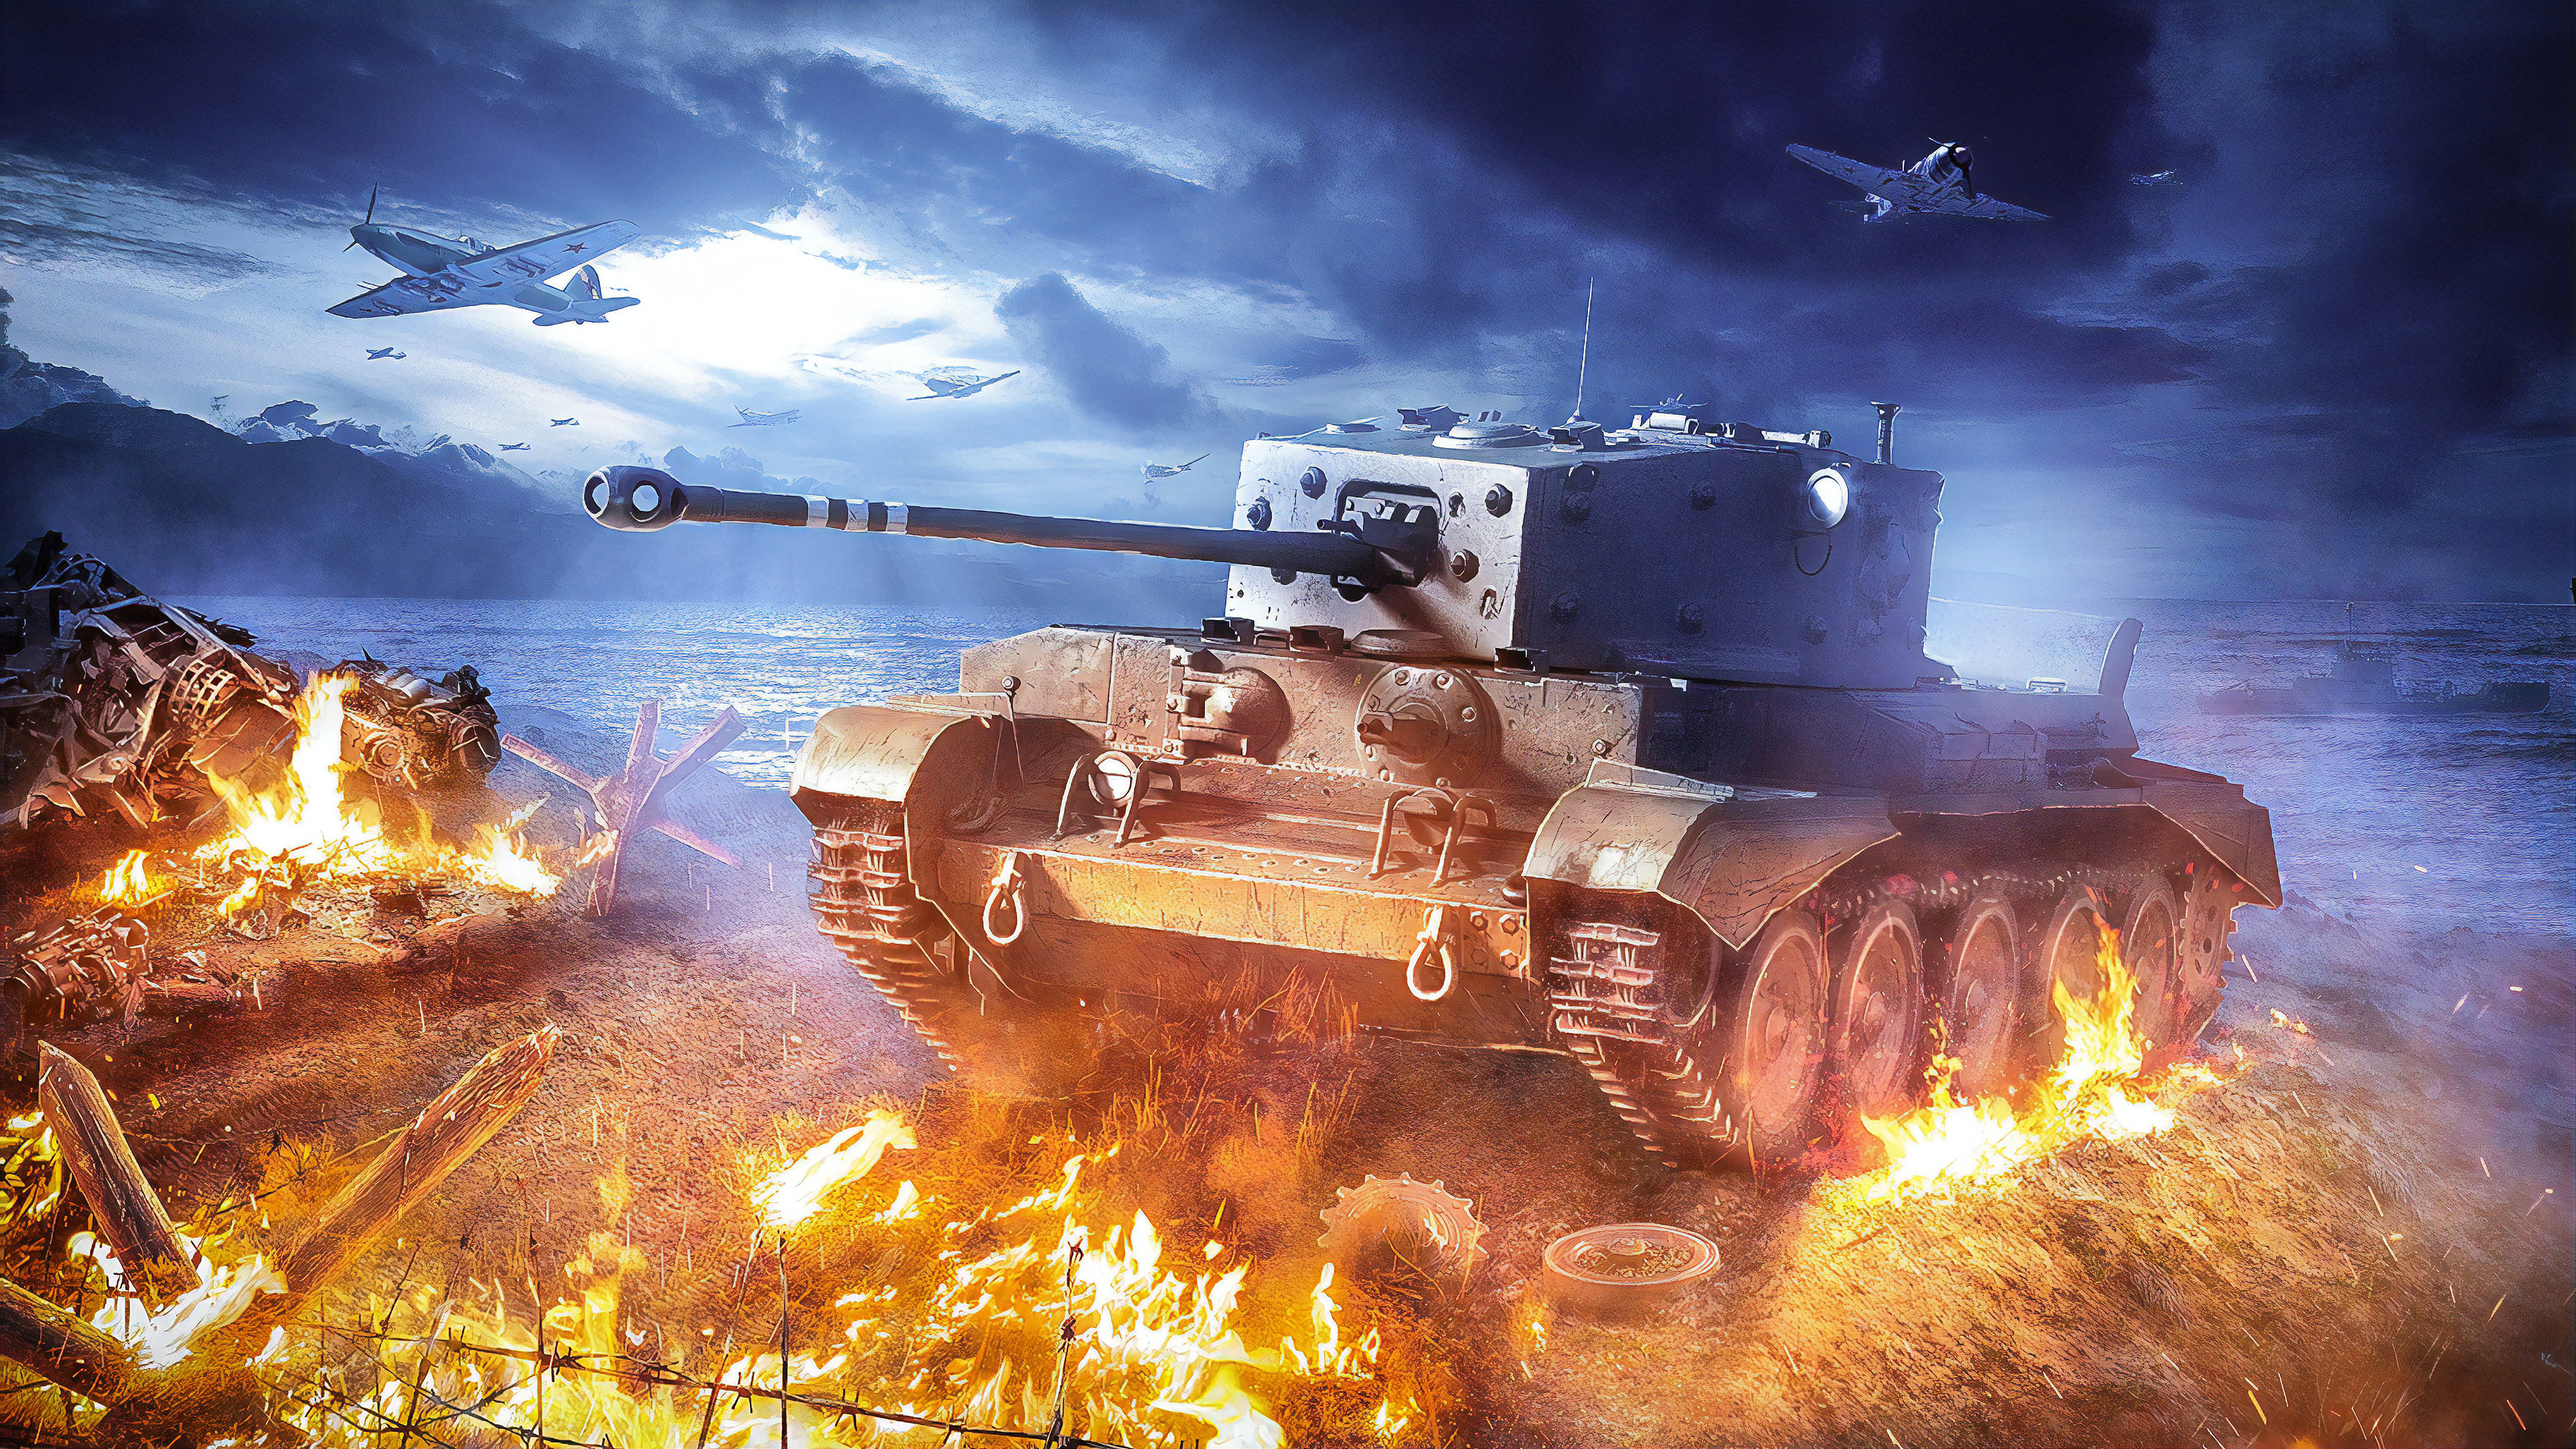 tank 1560535253 - Tank - tank wallpapers, hd-wallpapers, 4k-wallpapers